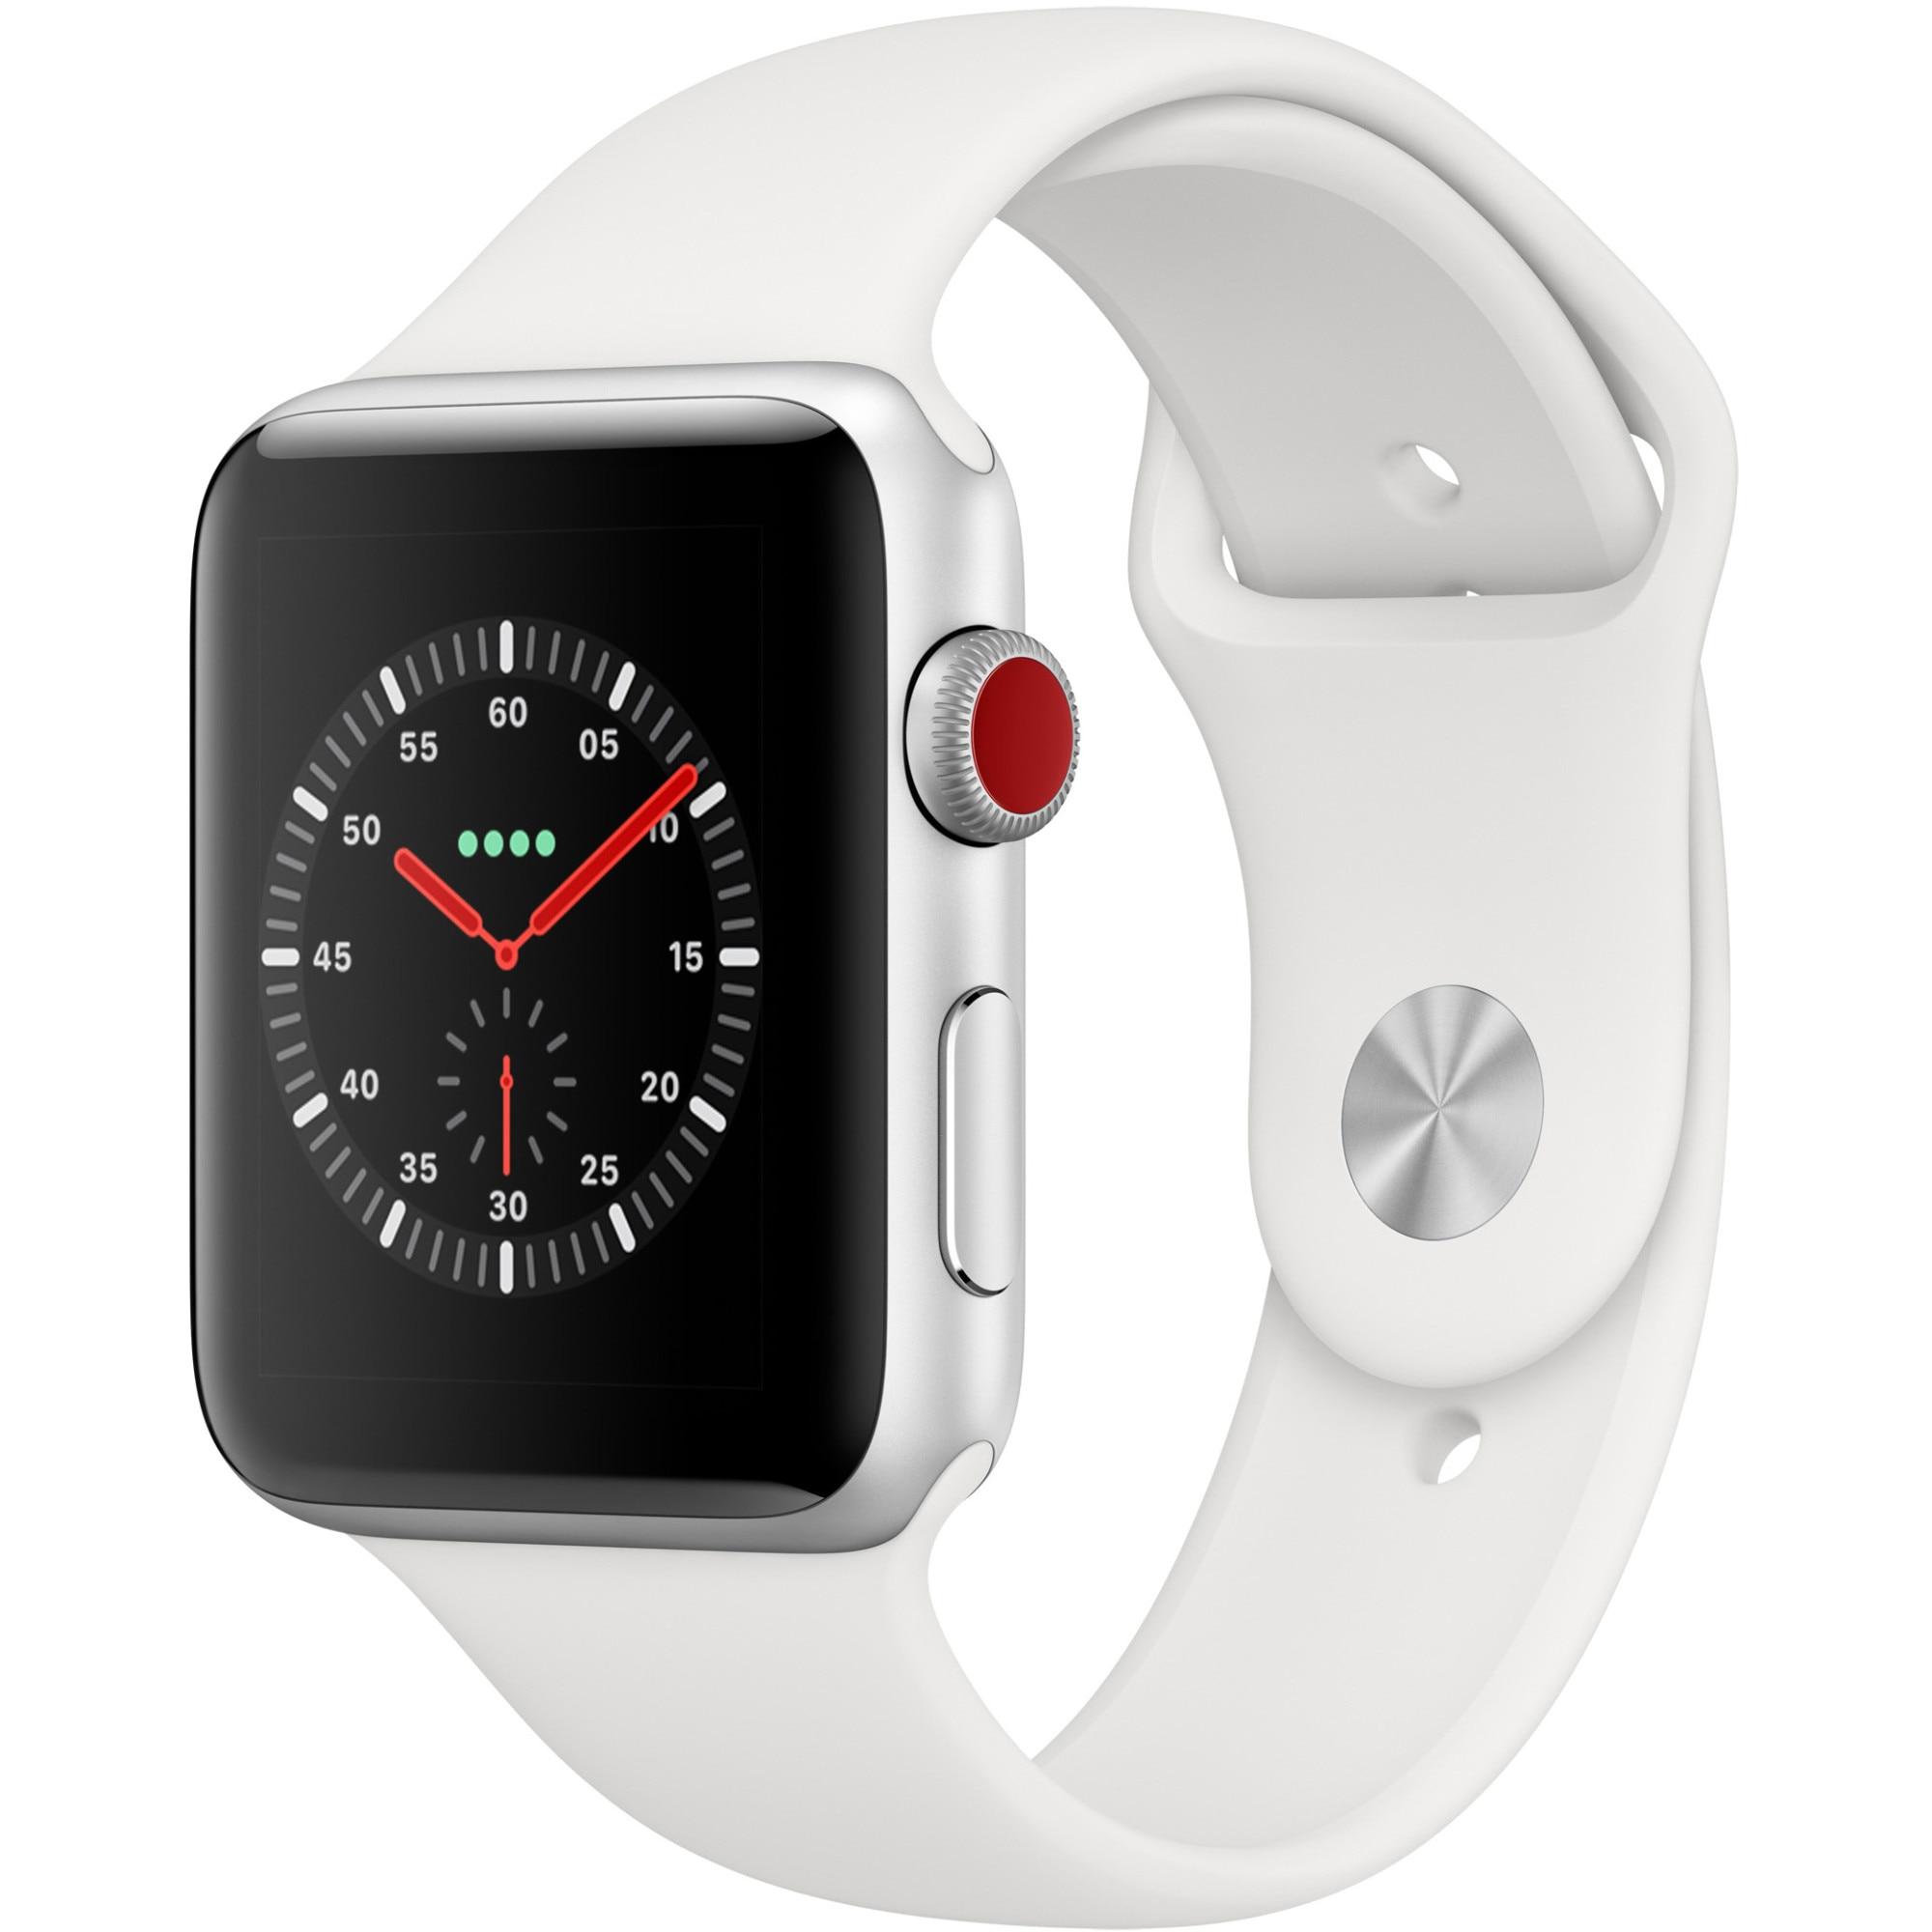 Fotografie Apple Watch 5, GPS, Cellular, Carcasa Silver Aluminium 44mm, White Sport Band - S/M & M/L